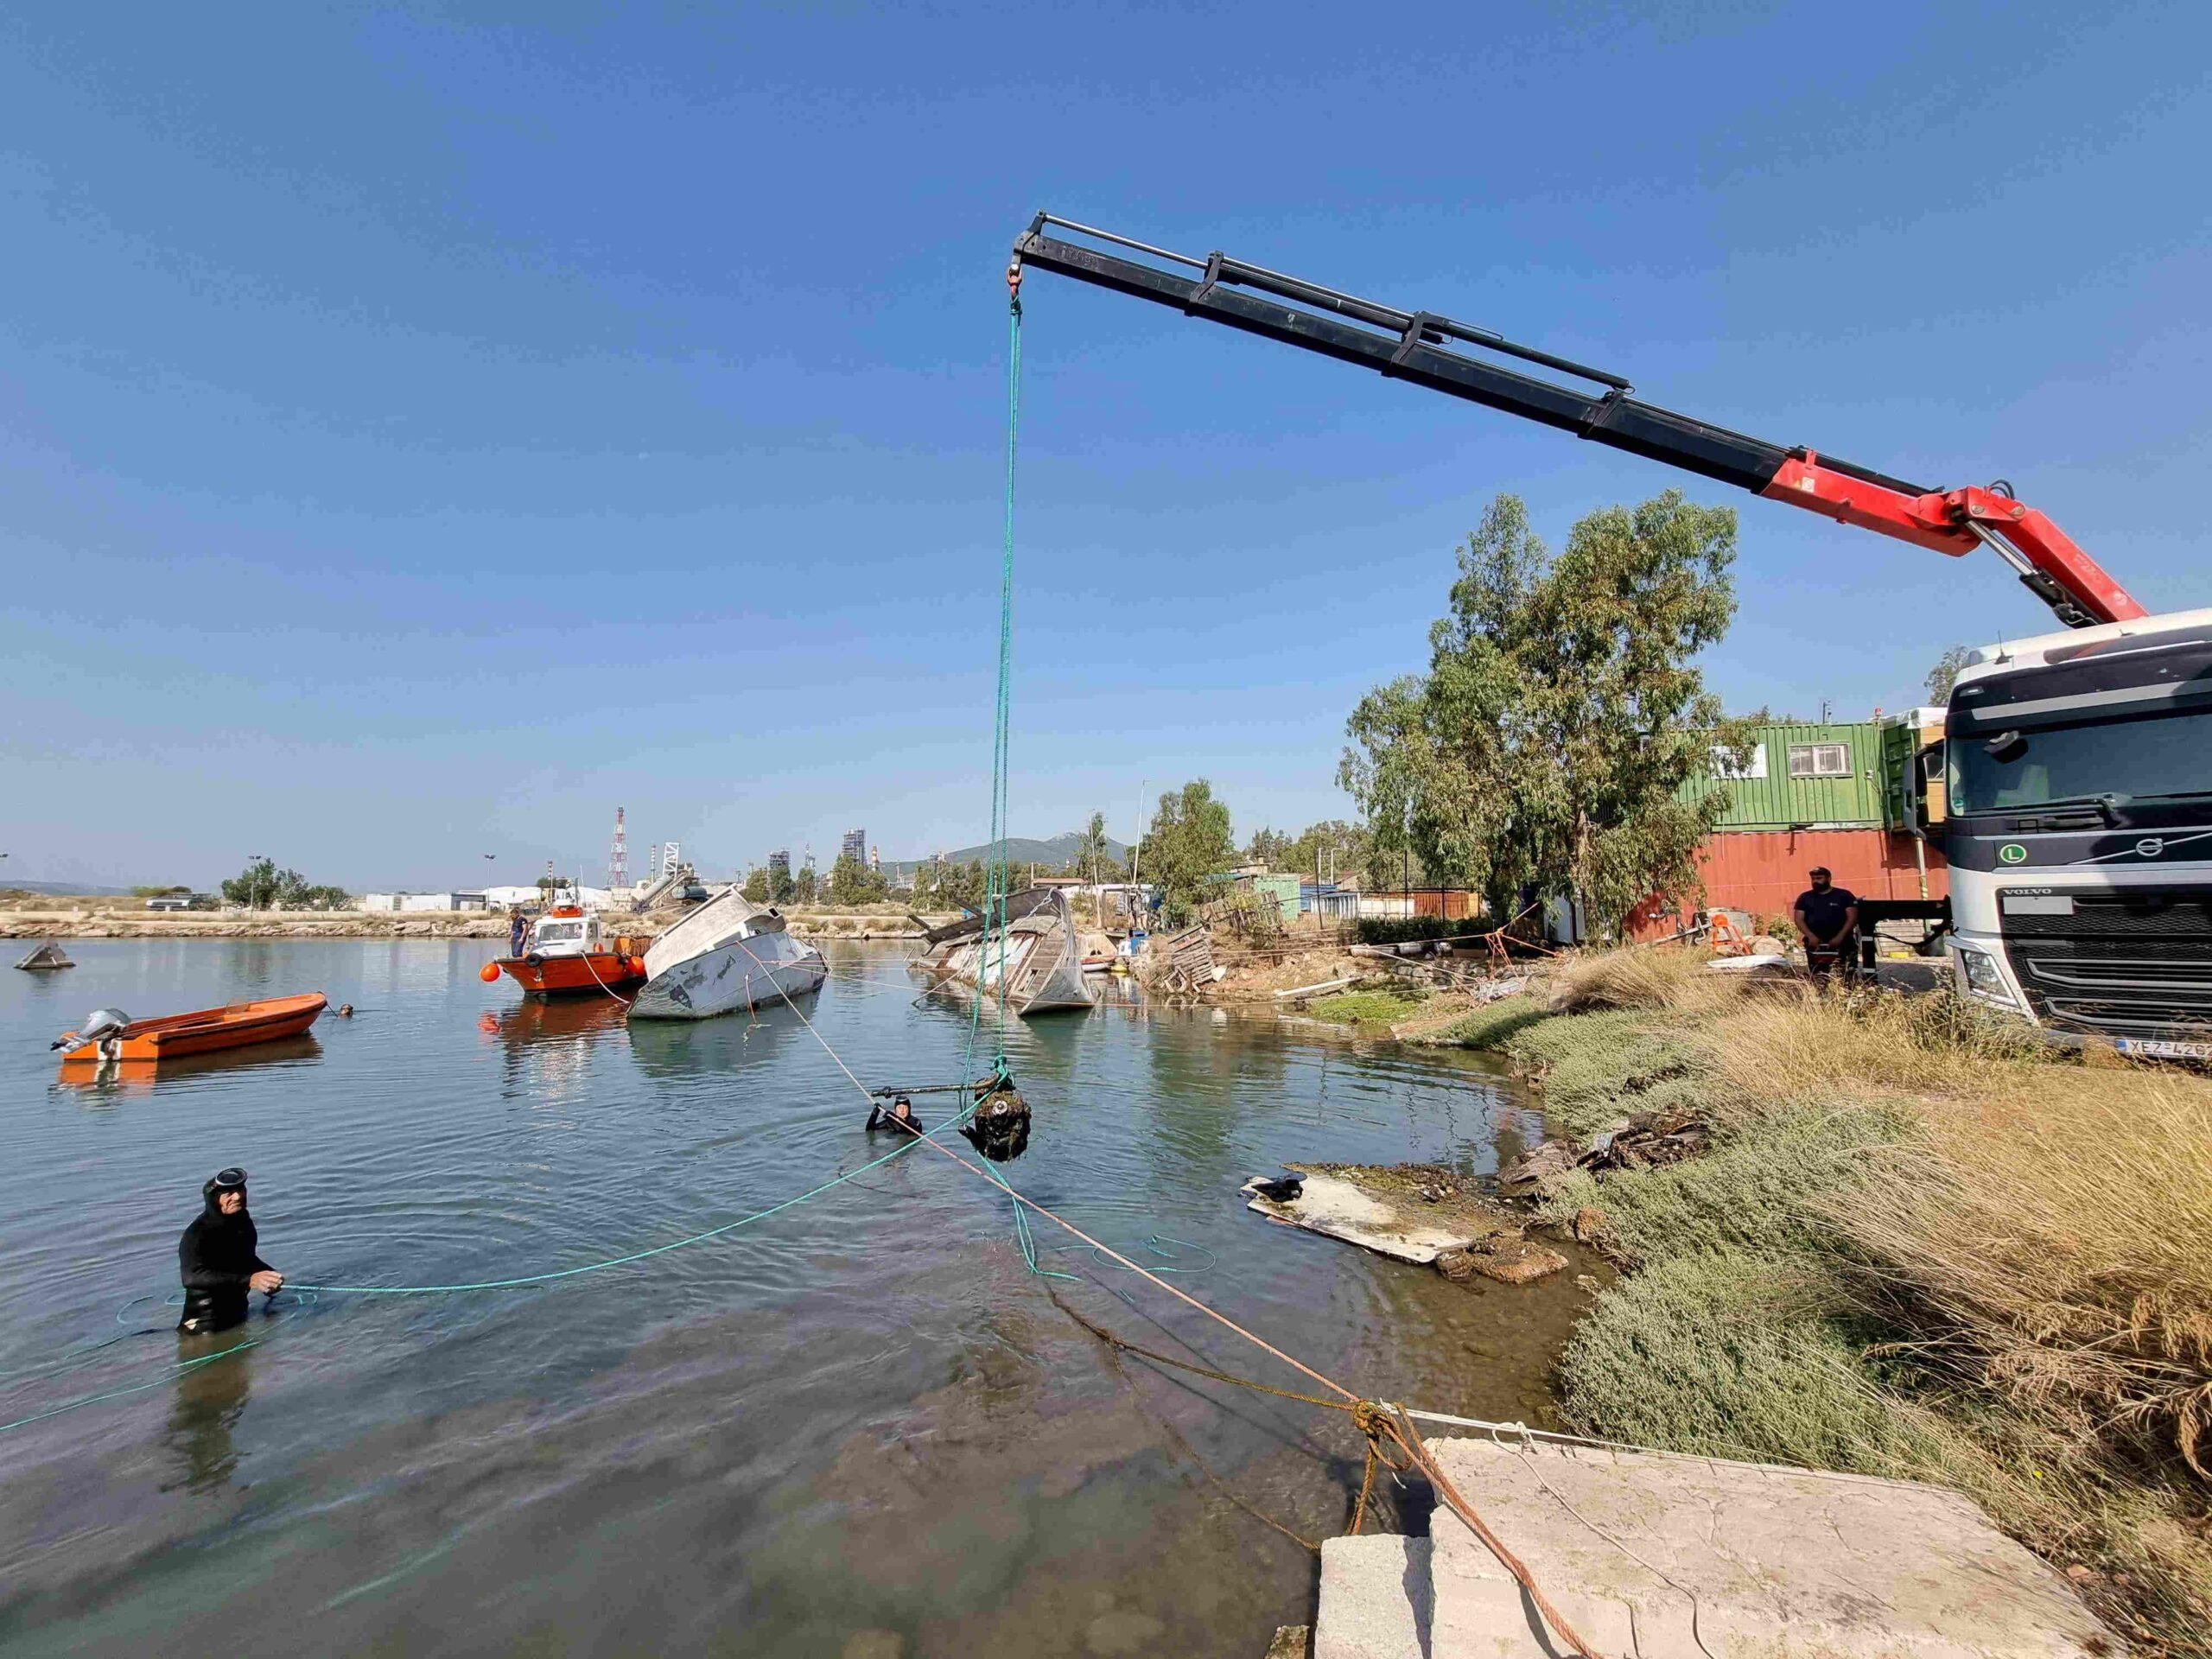 You are currently viewing Δράση καθαρισμού του βυθού και της χερσαίας ζώνης λιμένος Ελευσίνας στην περιοχή Βλύχα